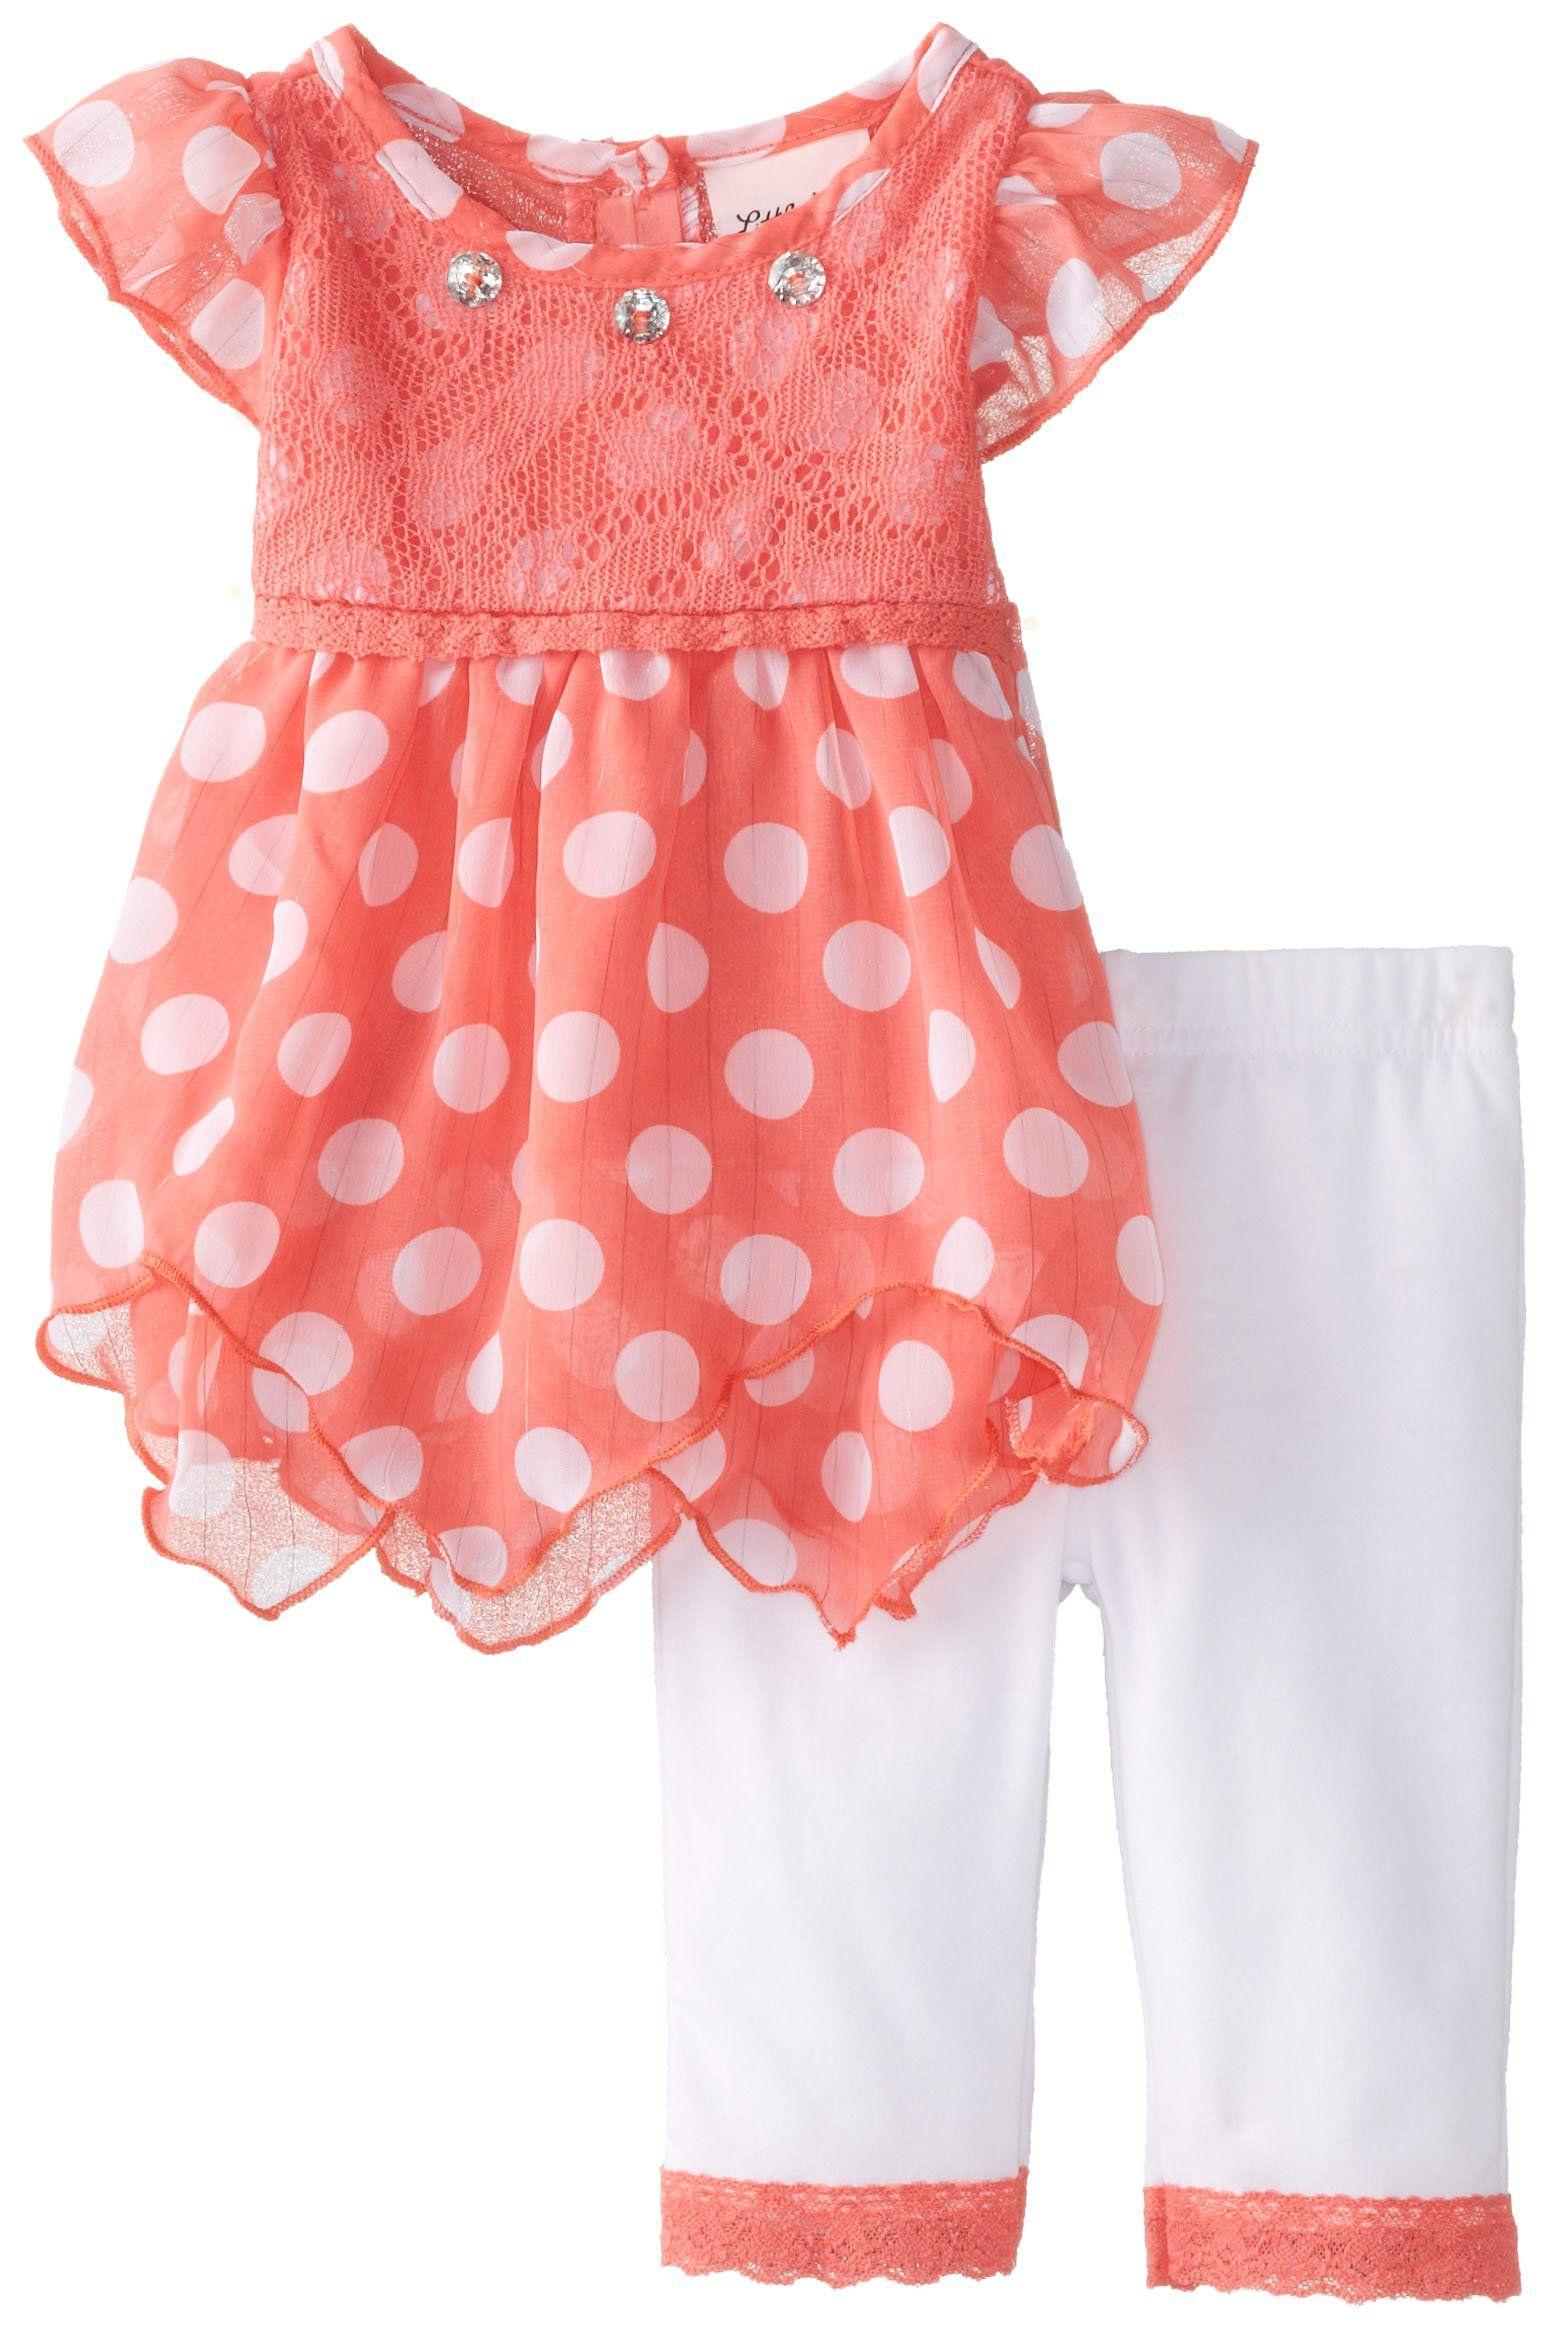 6b4345a4a6770 Amazon.com: Little Lass Baby Girls' 2Pc Chiffon Set Polka Dots, Coral, 12  Months: Clothing